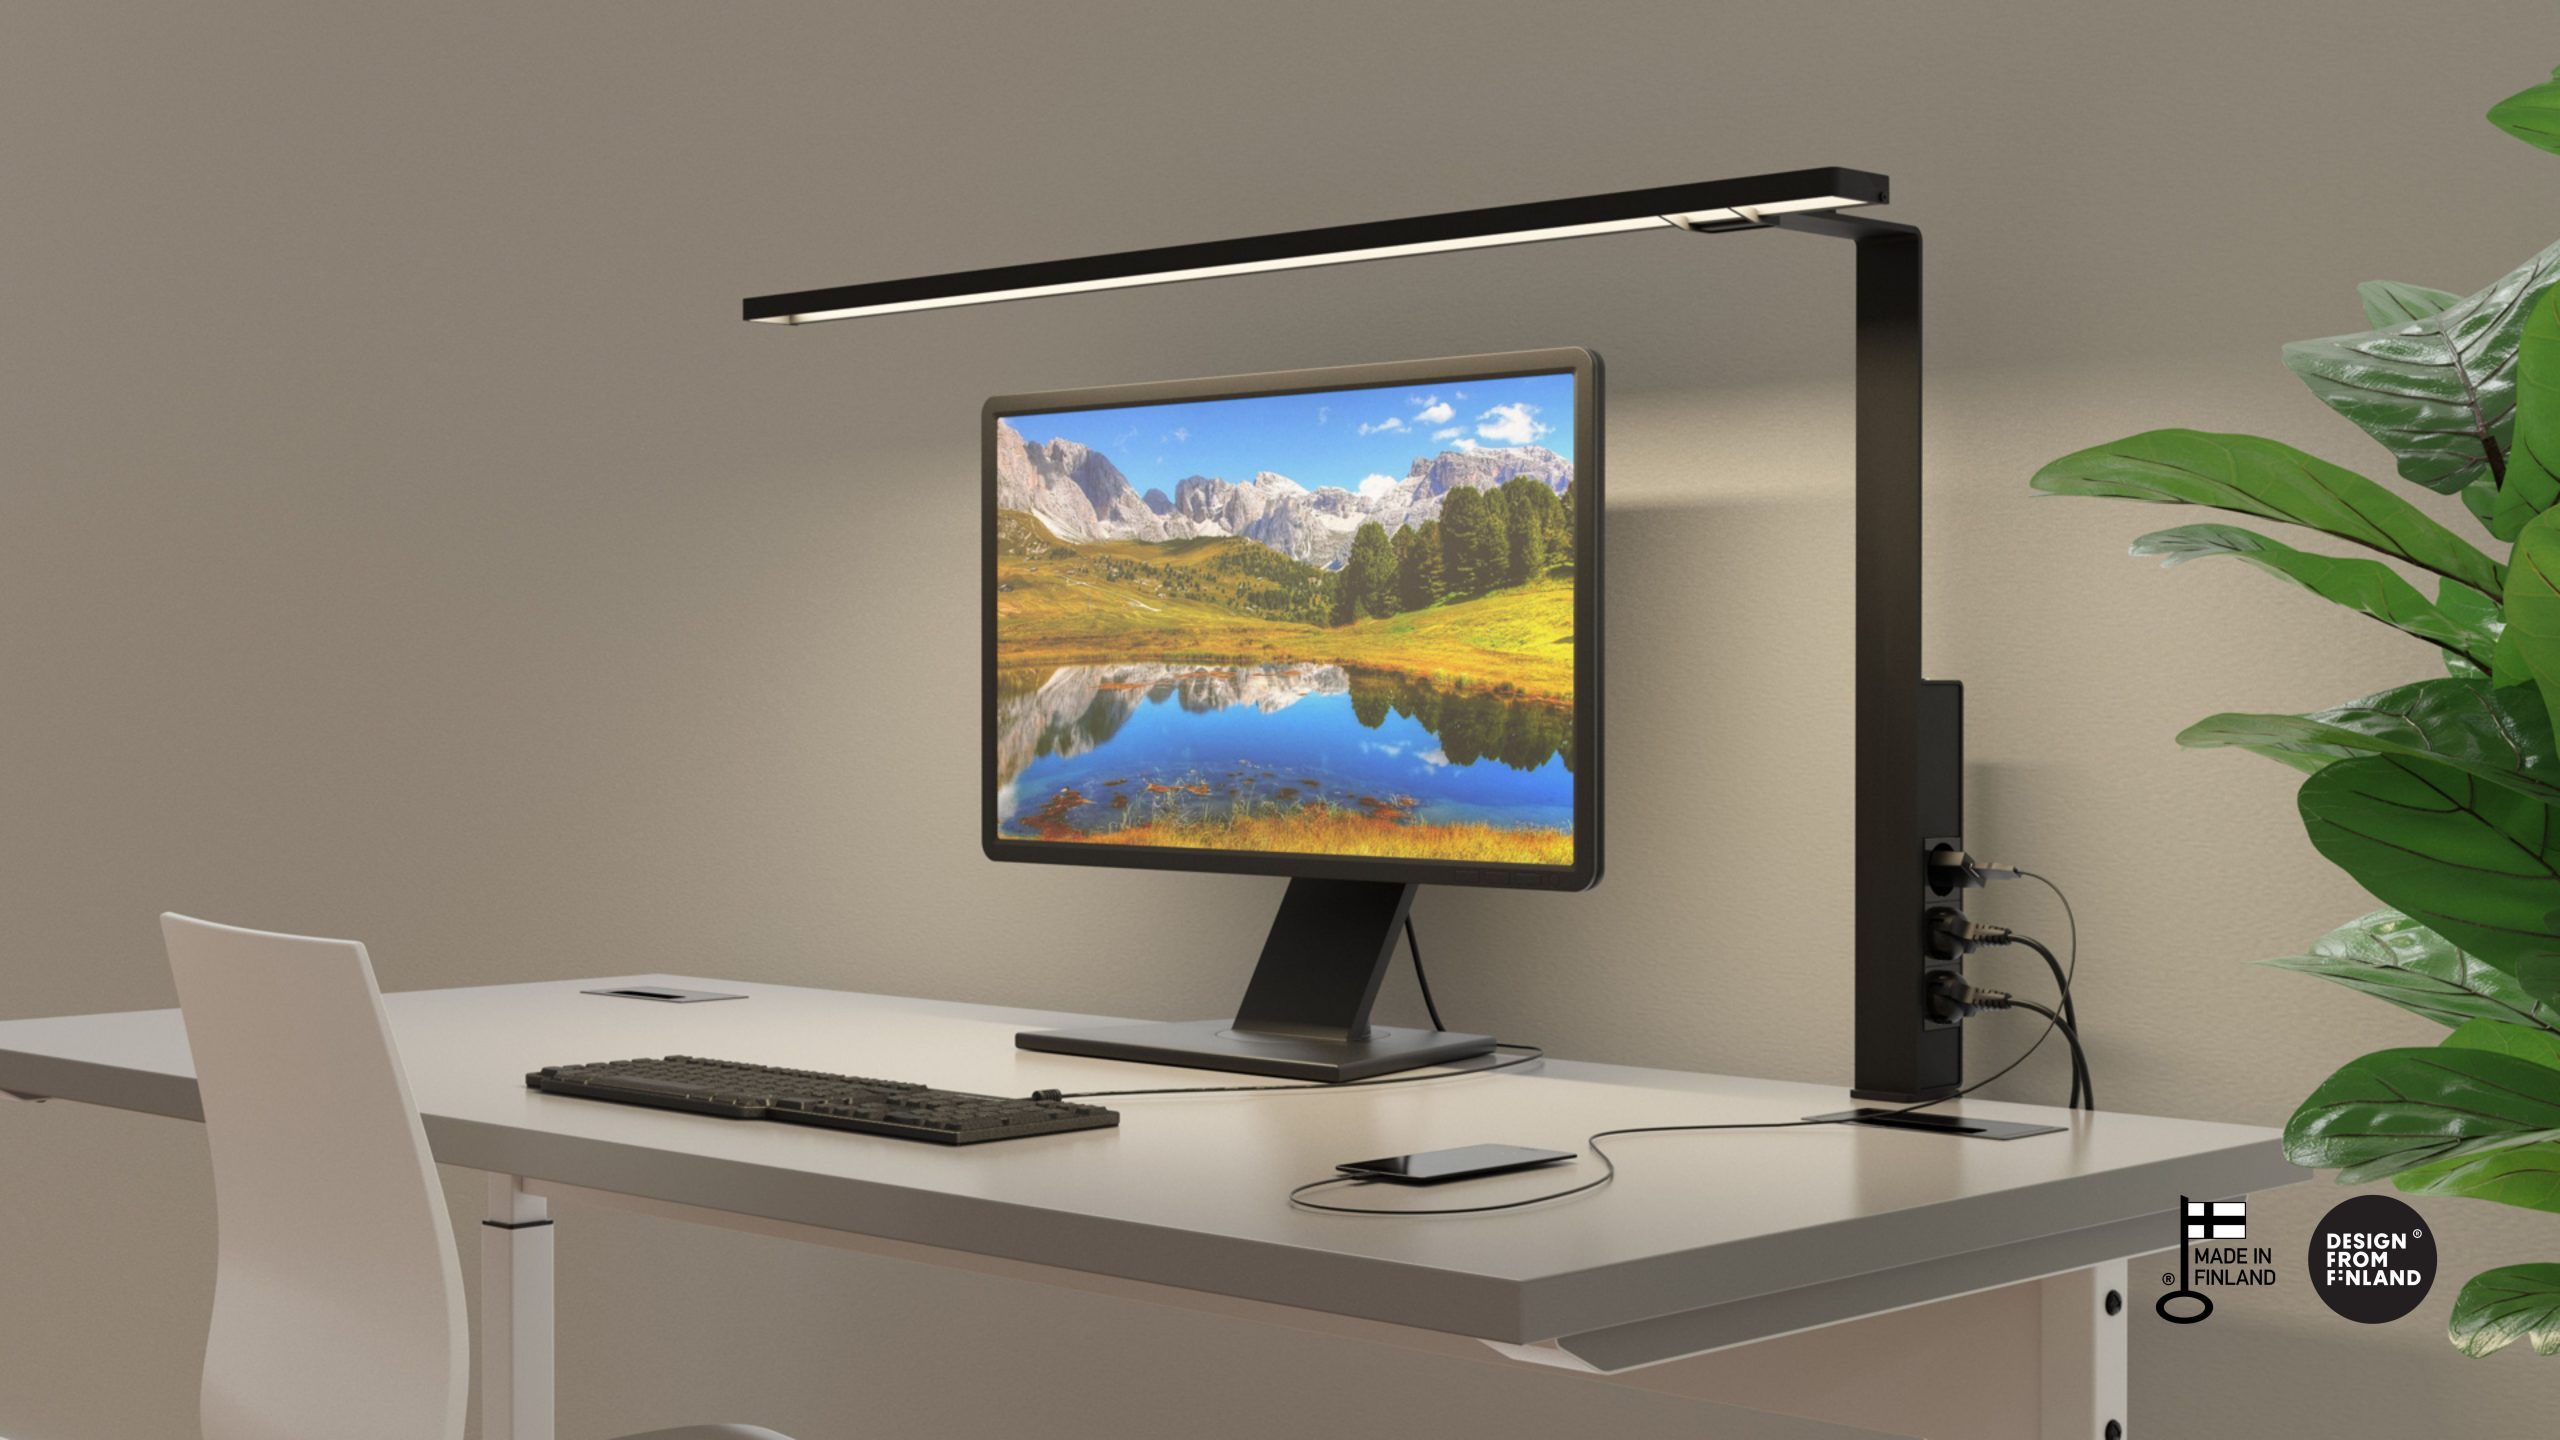 aicci-dl1-1120ds-work-desk-lamp-socket-unit-black-design-key-flag-logos